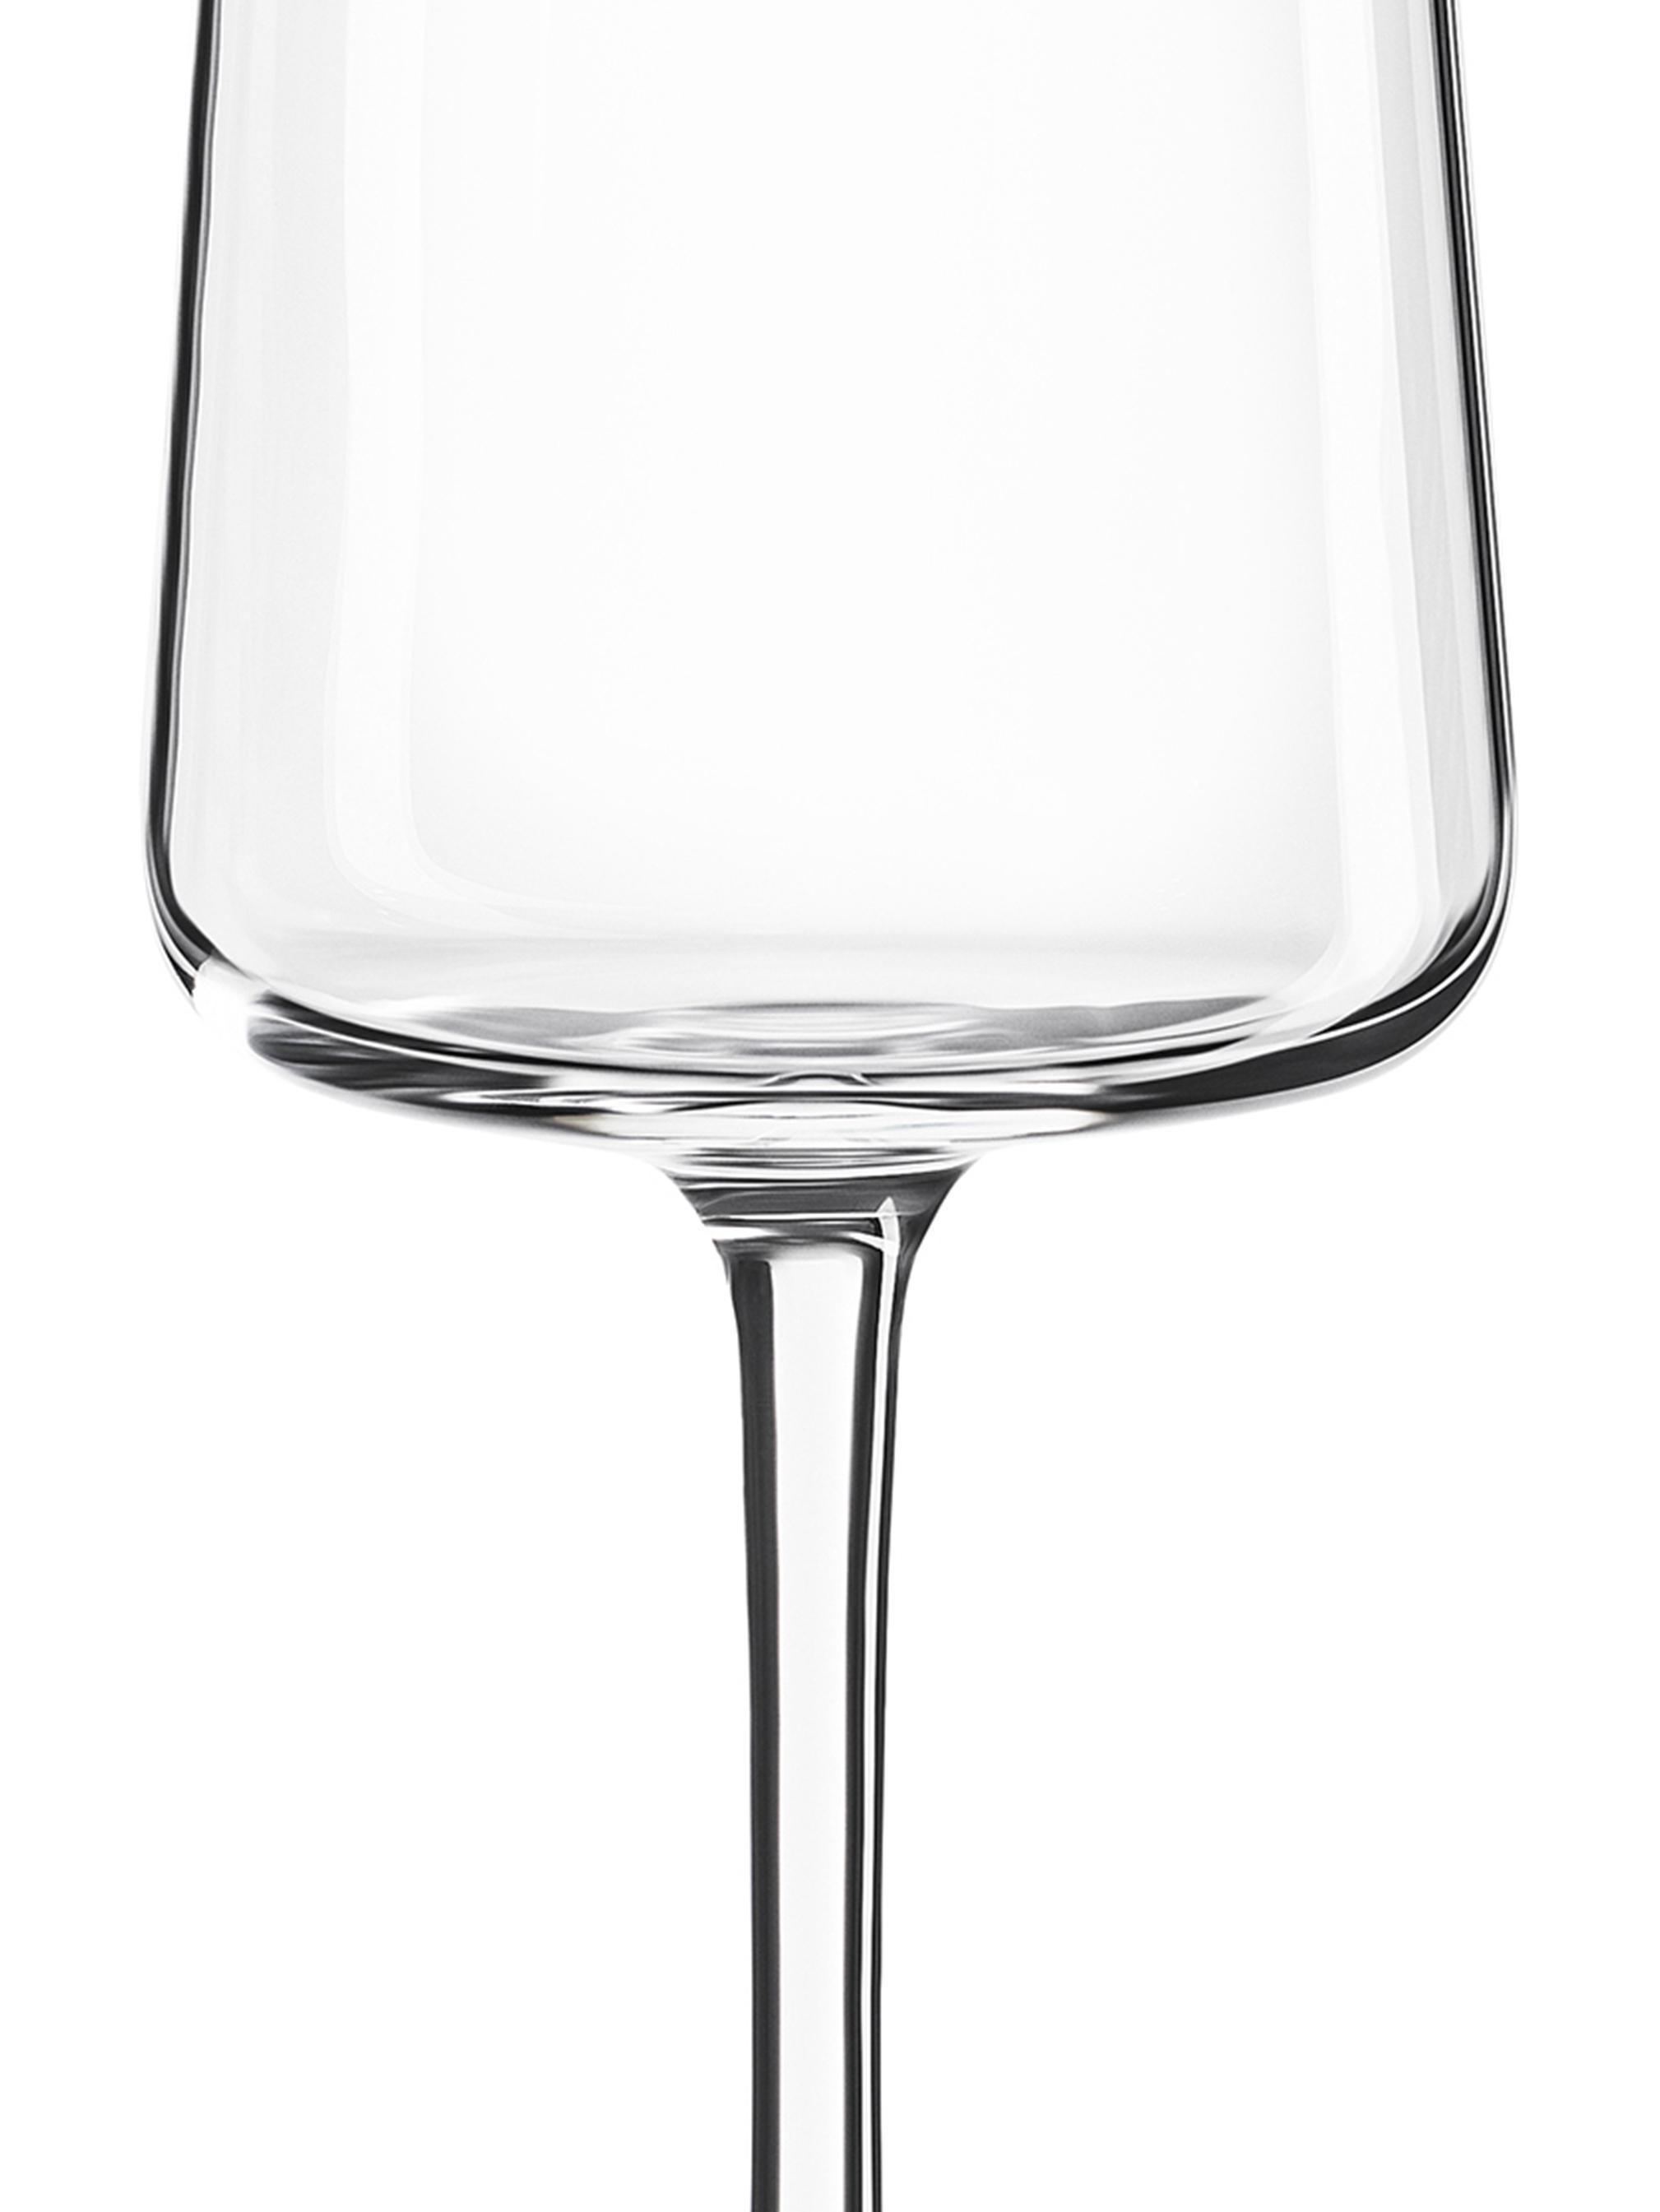 Kristall-Sektgläser Power in Kegelform, 6er-Set, Kristallglas, Transparent, Ø 7 x H 23 cm